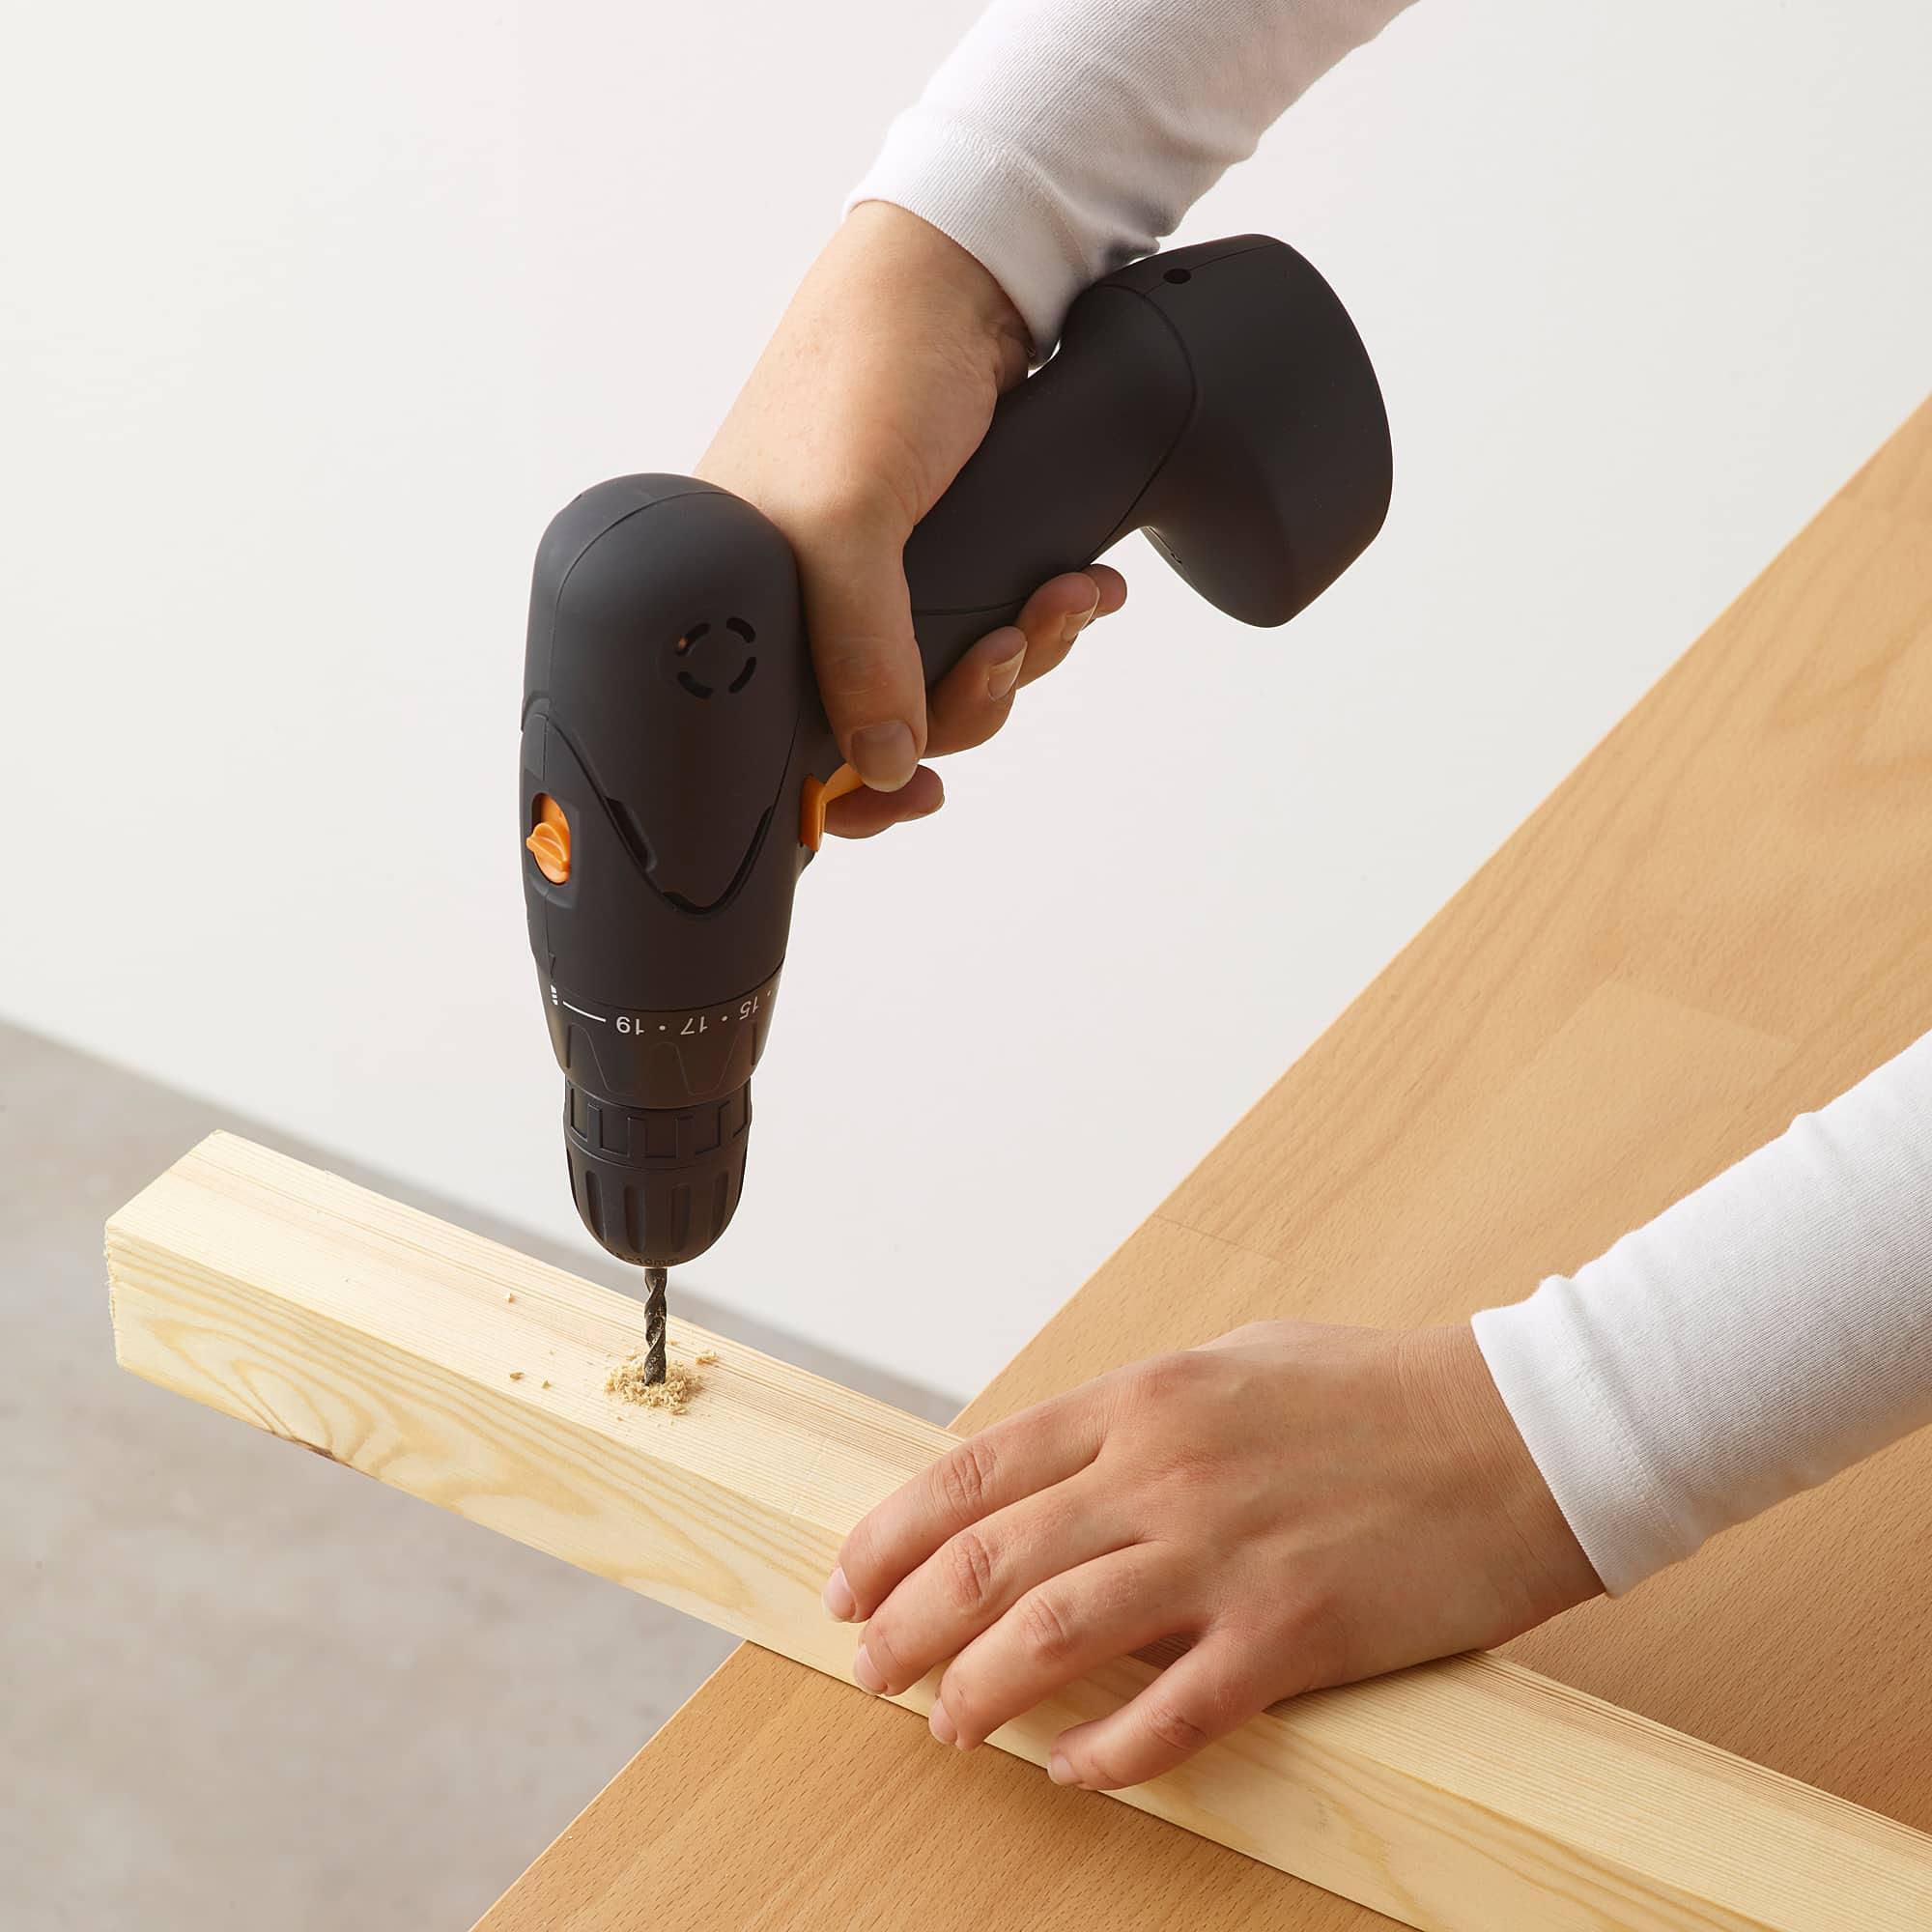 IKEA-FIXA-Screwdriver-Drill